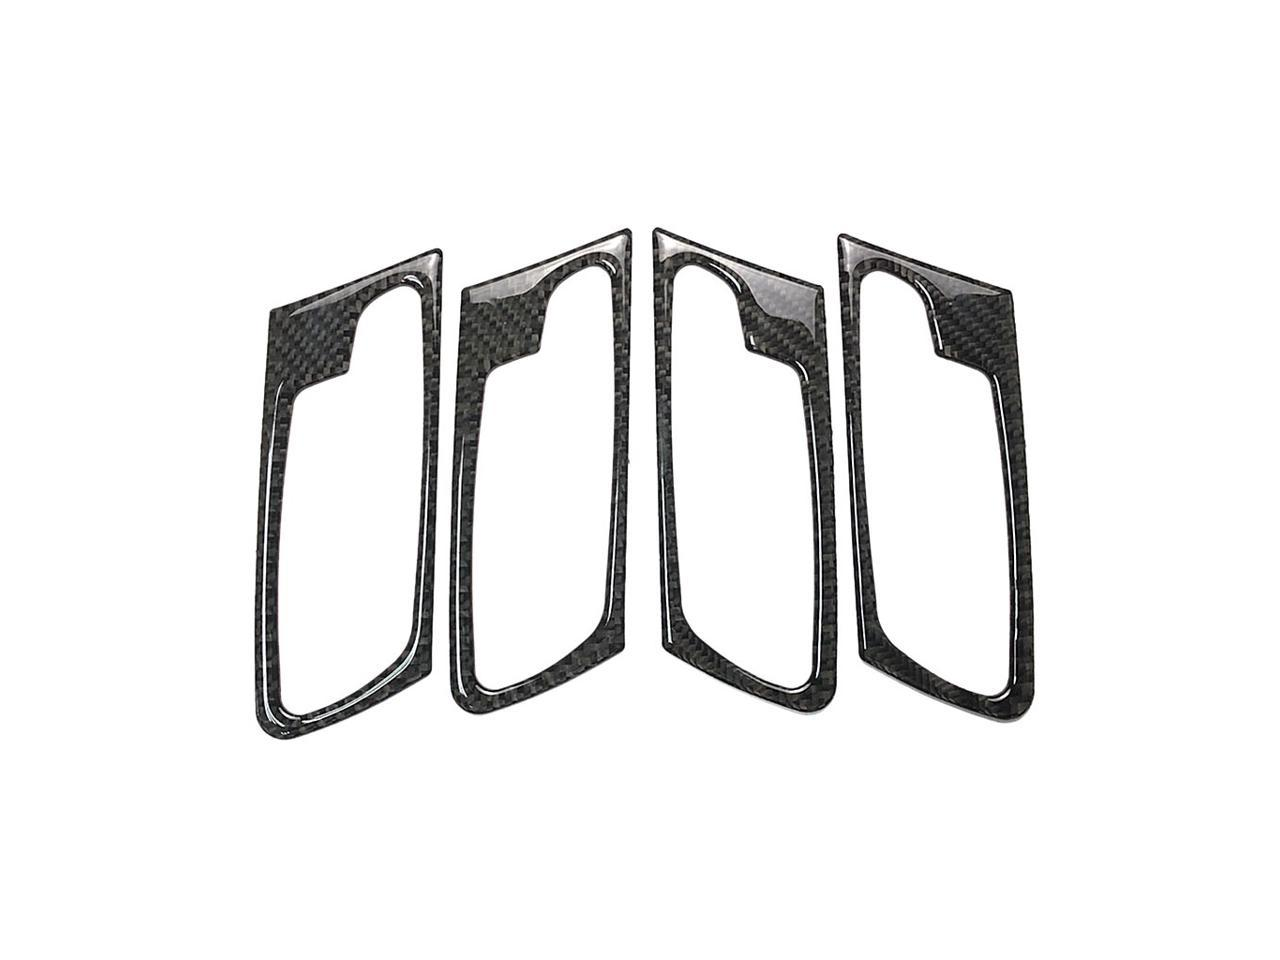 4 Pieces Door Interior Handle Cover Trims for BMW X5 E70